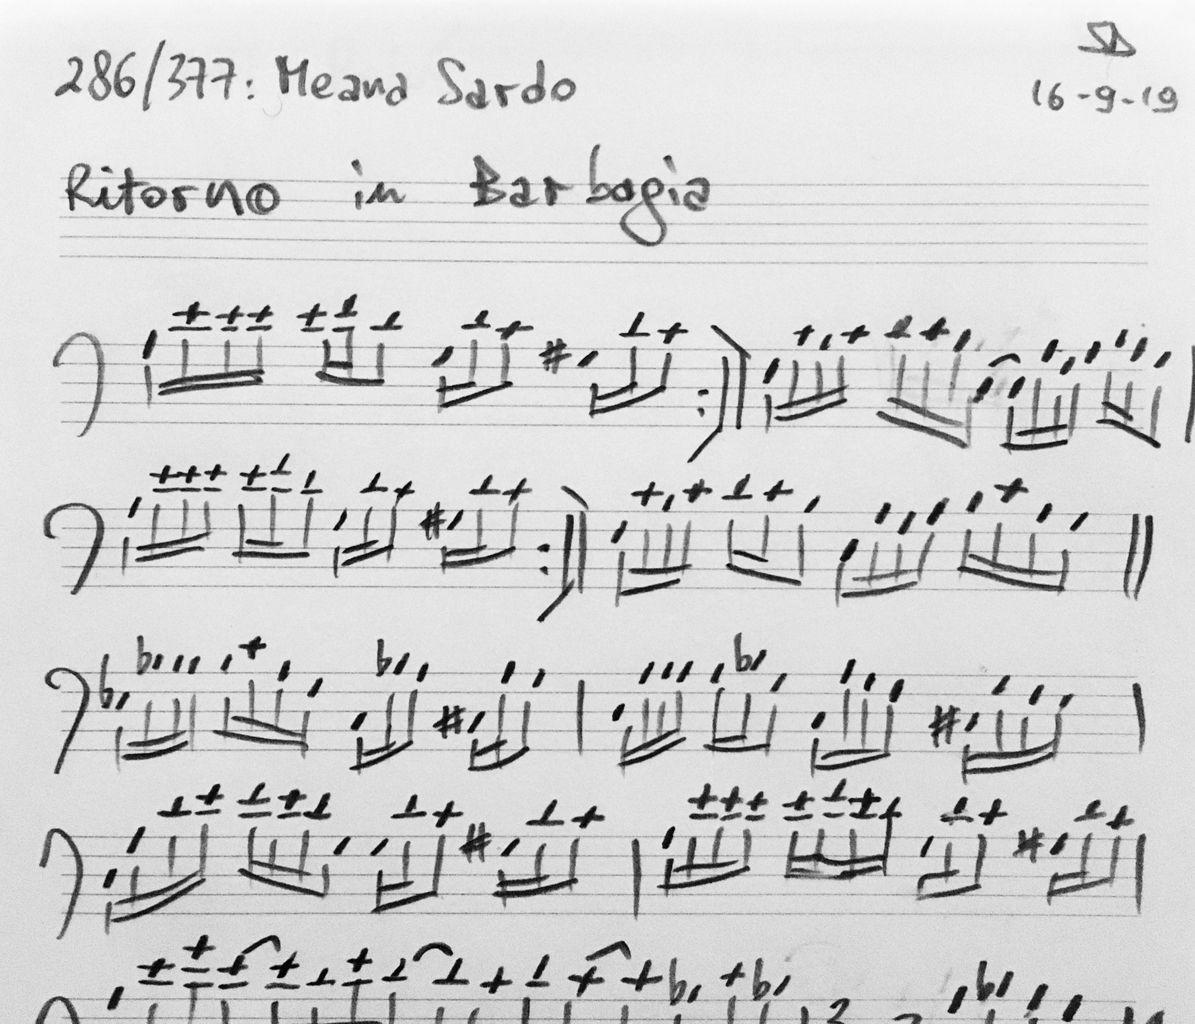 286-Meana-Sardo-score